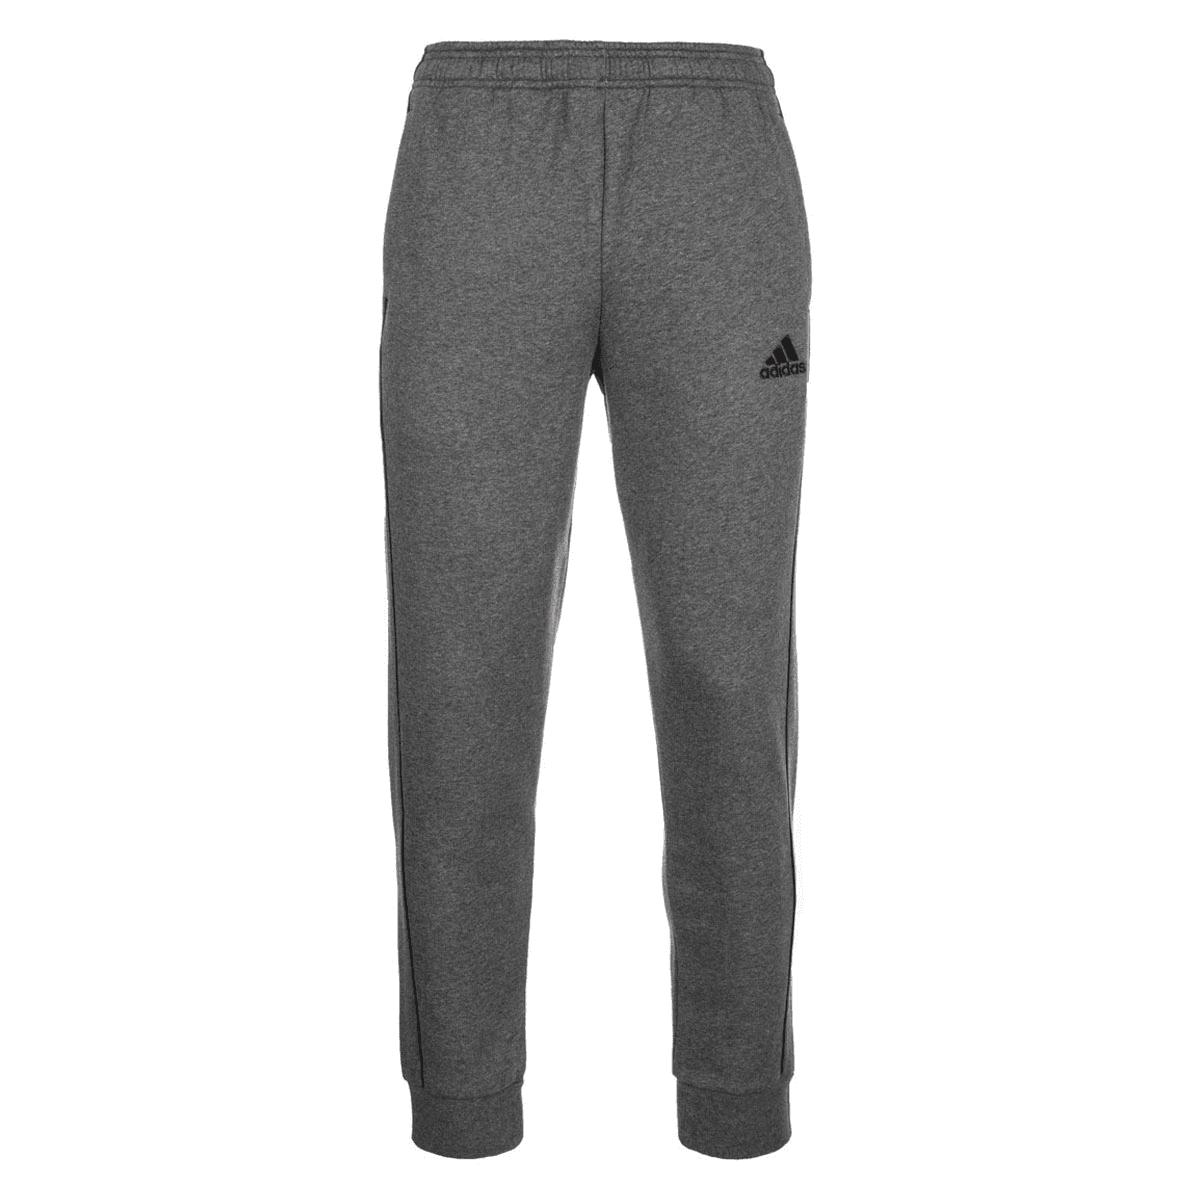 Adidas trainingsbroek Core 18 Sweat Pants grijszwart Voetbal shop